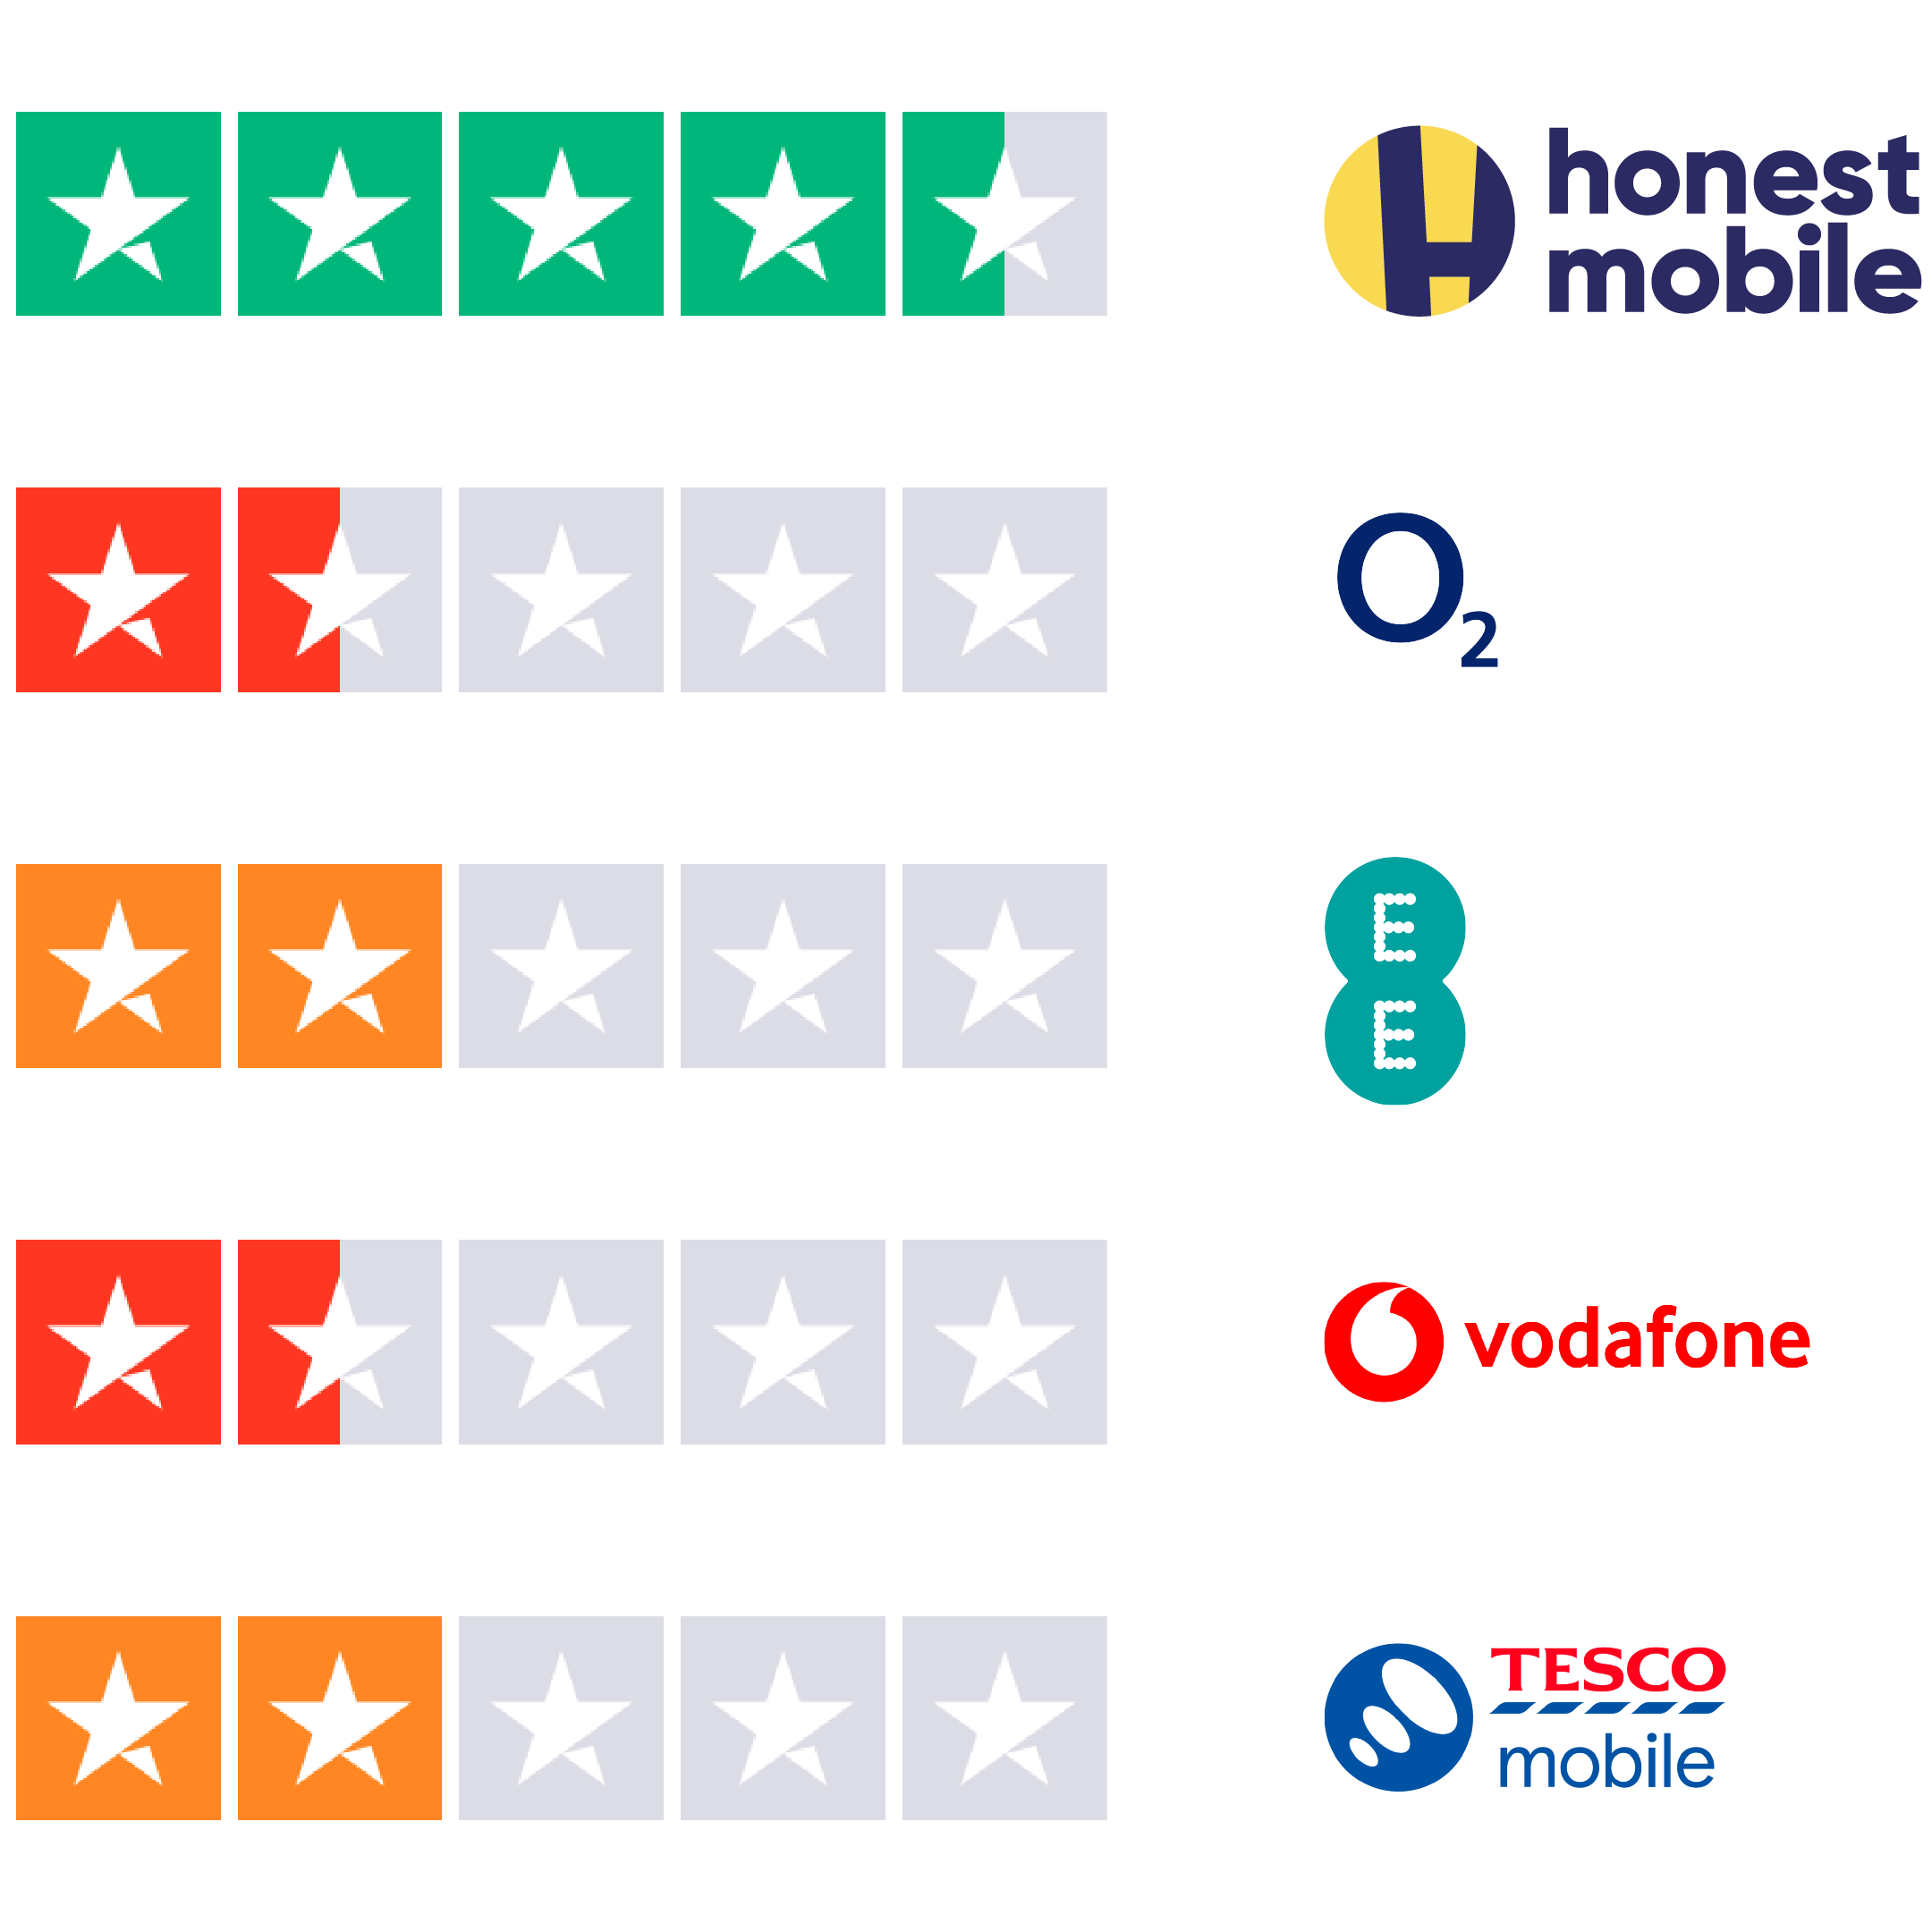 Honest Mobile Trustpilot comparison showing Honest as the top rated network on Trustpilot